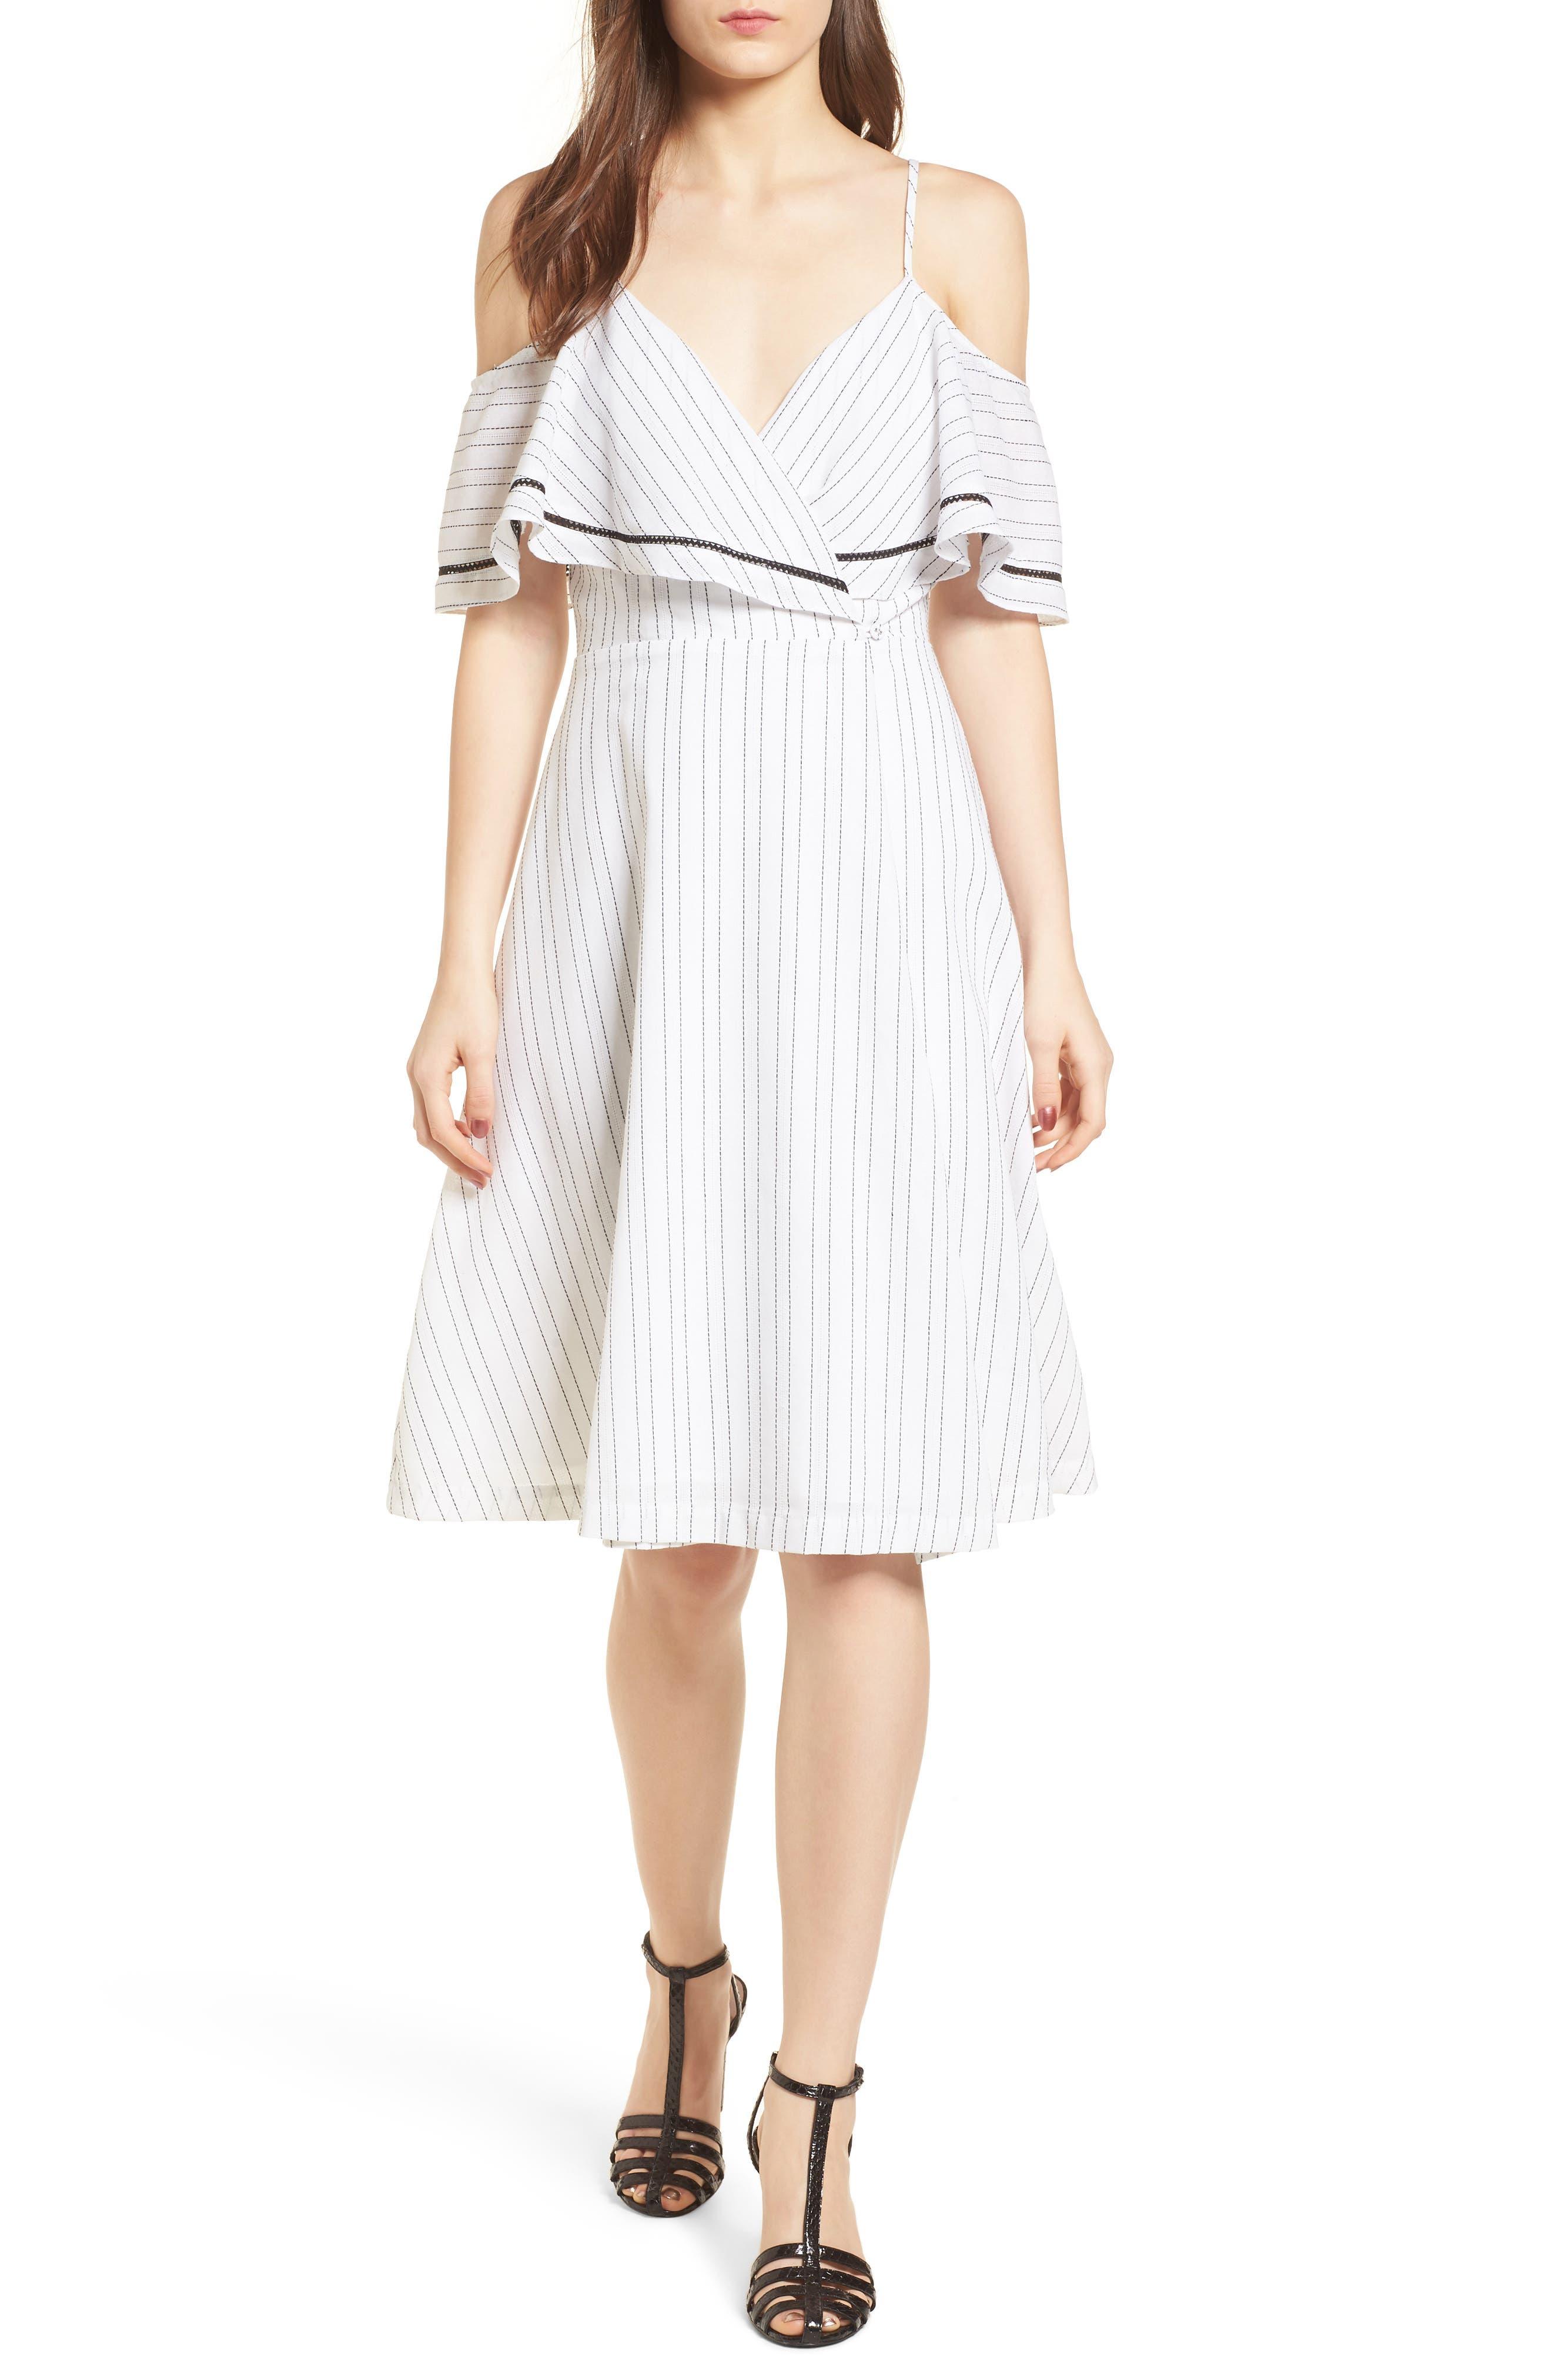 Cold Shoulder Midi Dress,                             Main thumbnail 1, color,                             White/ Black